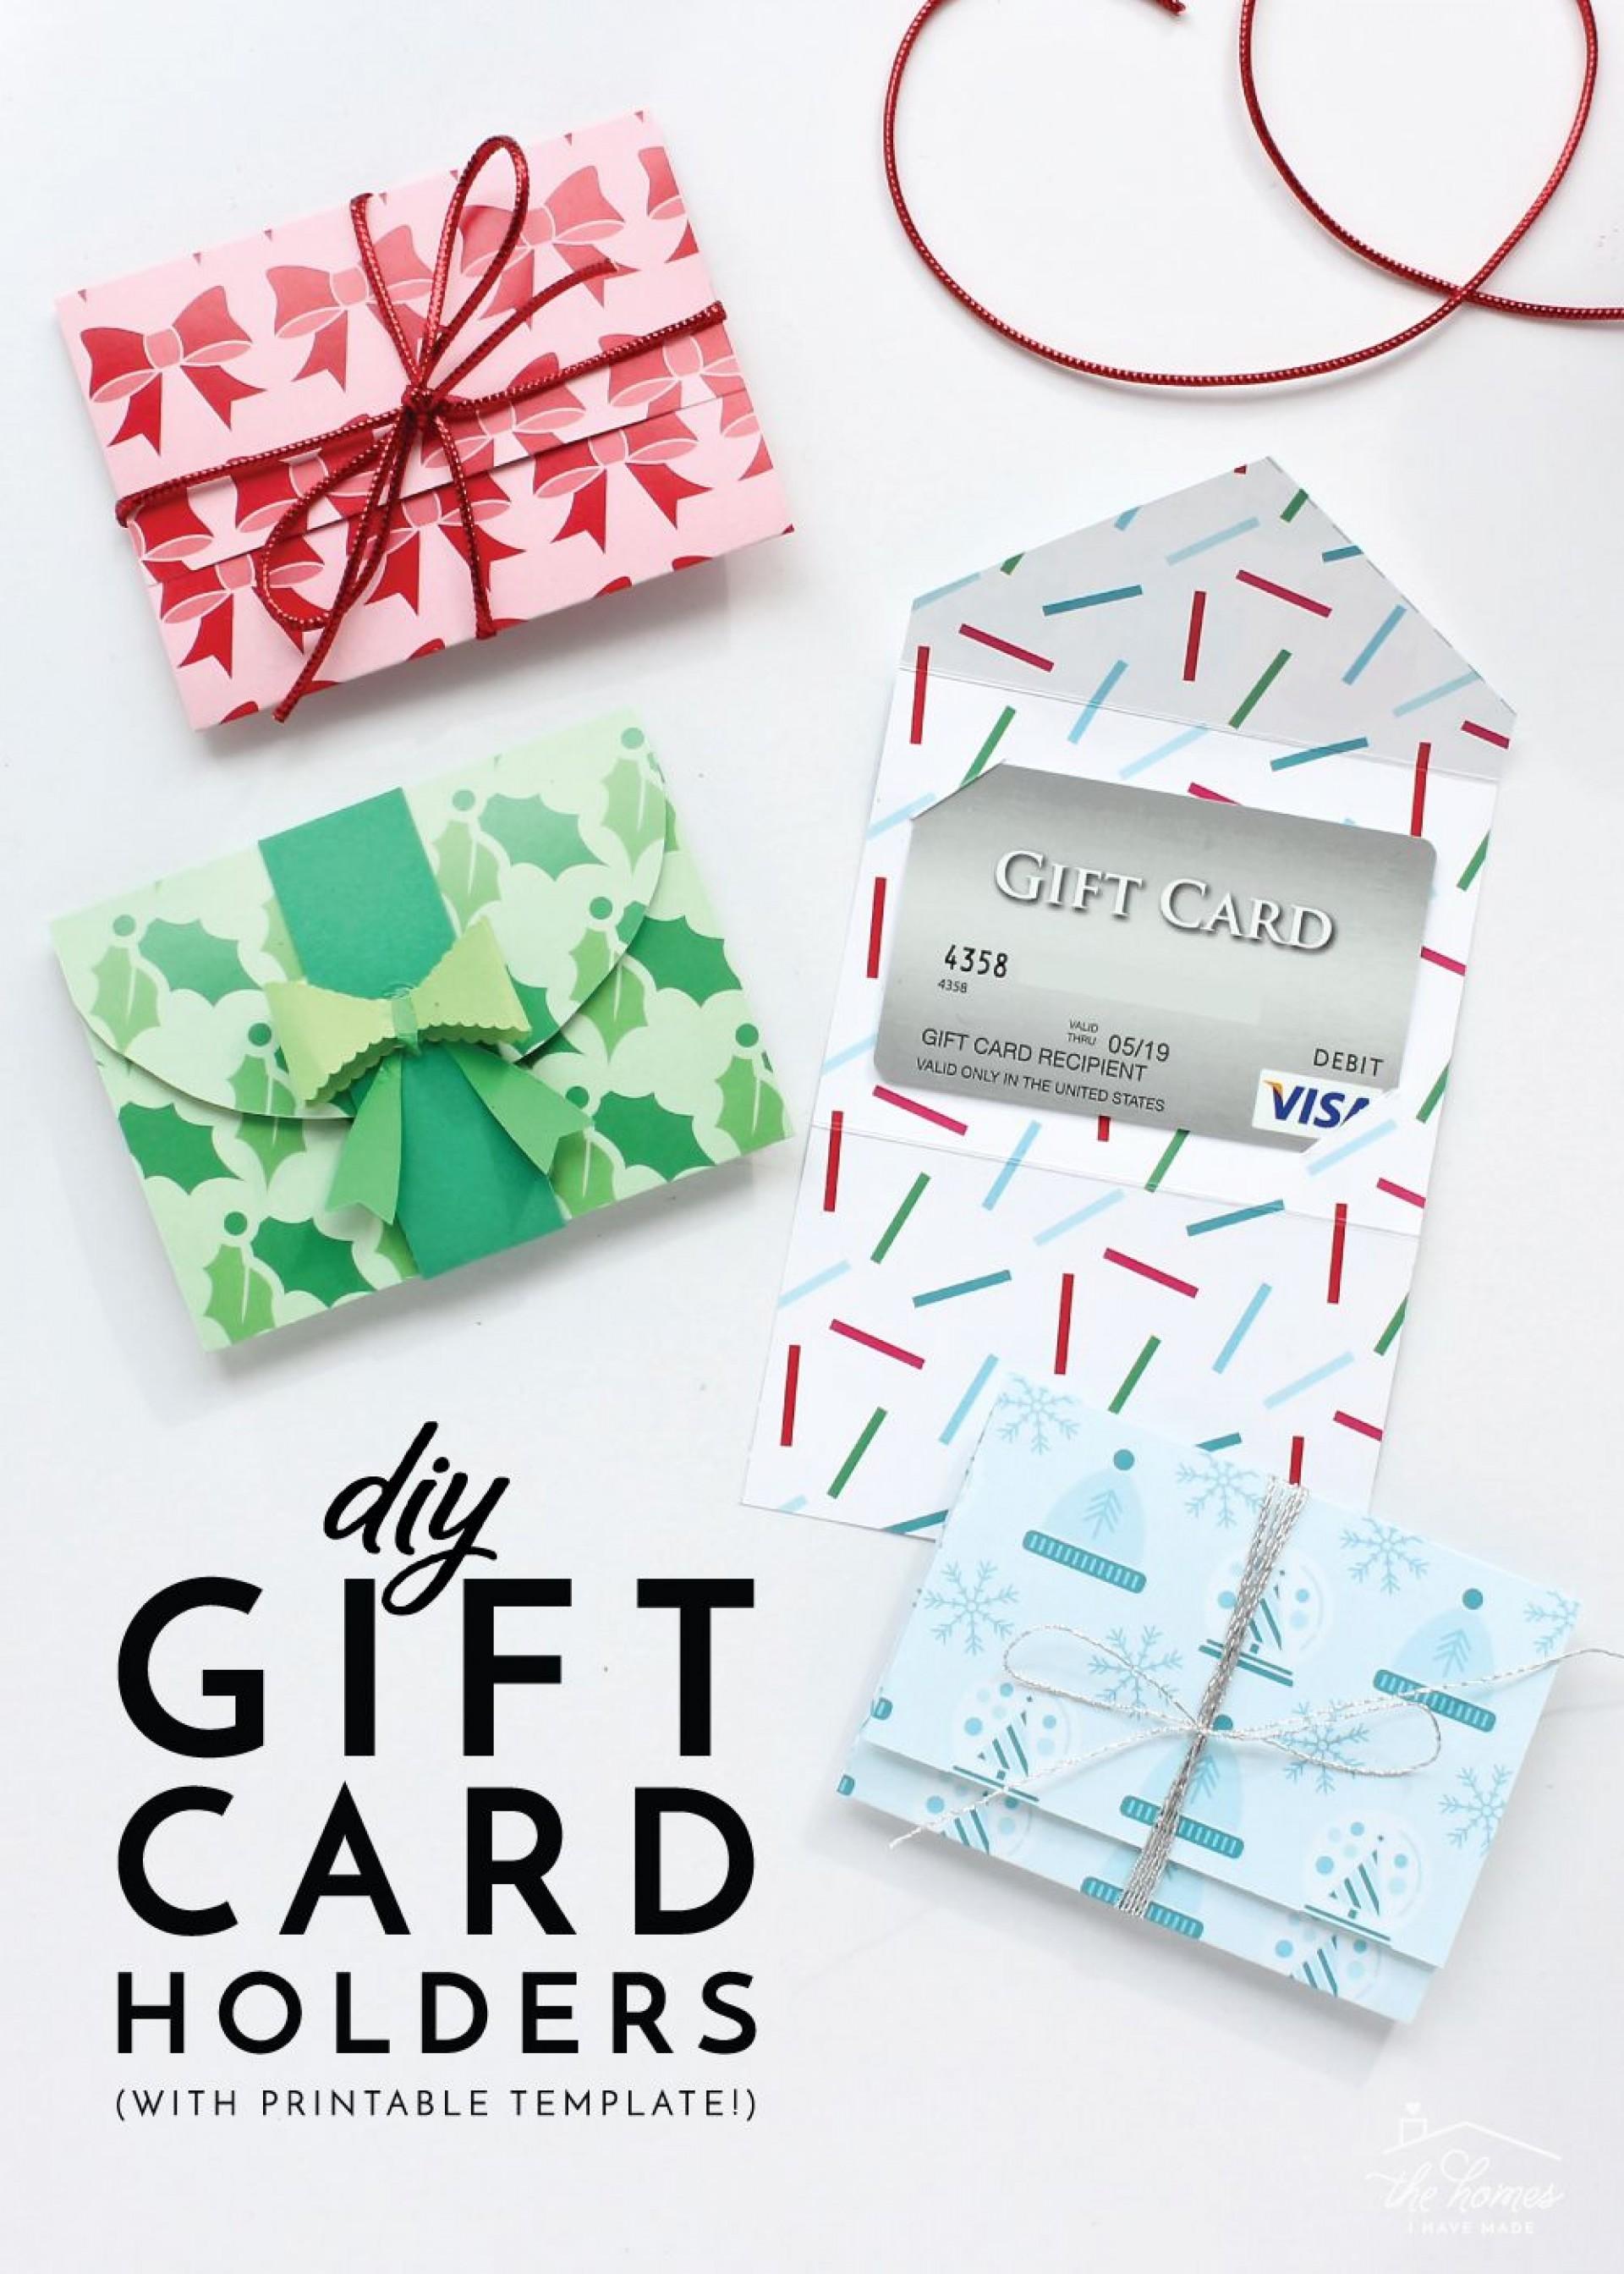 010 Stunning Gift Card Envelope Template Idea  Templates Voucher Diy Free Printable1920